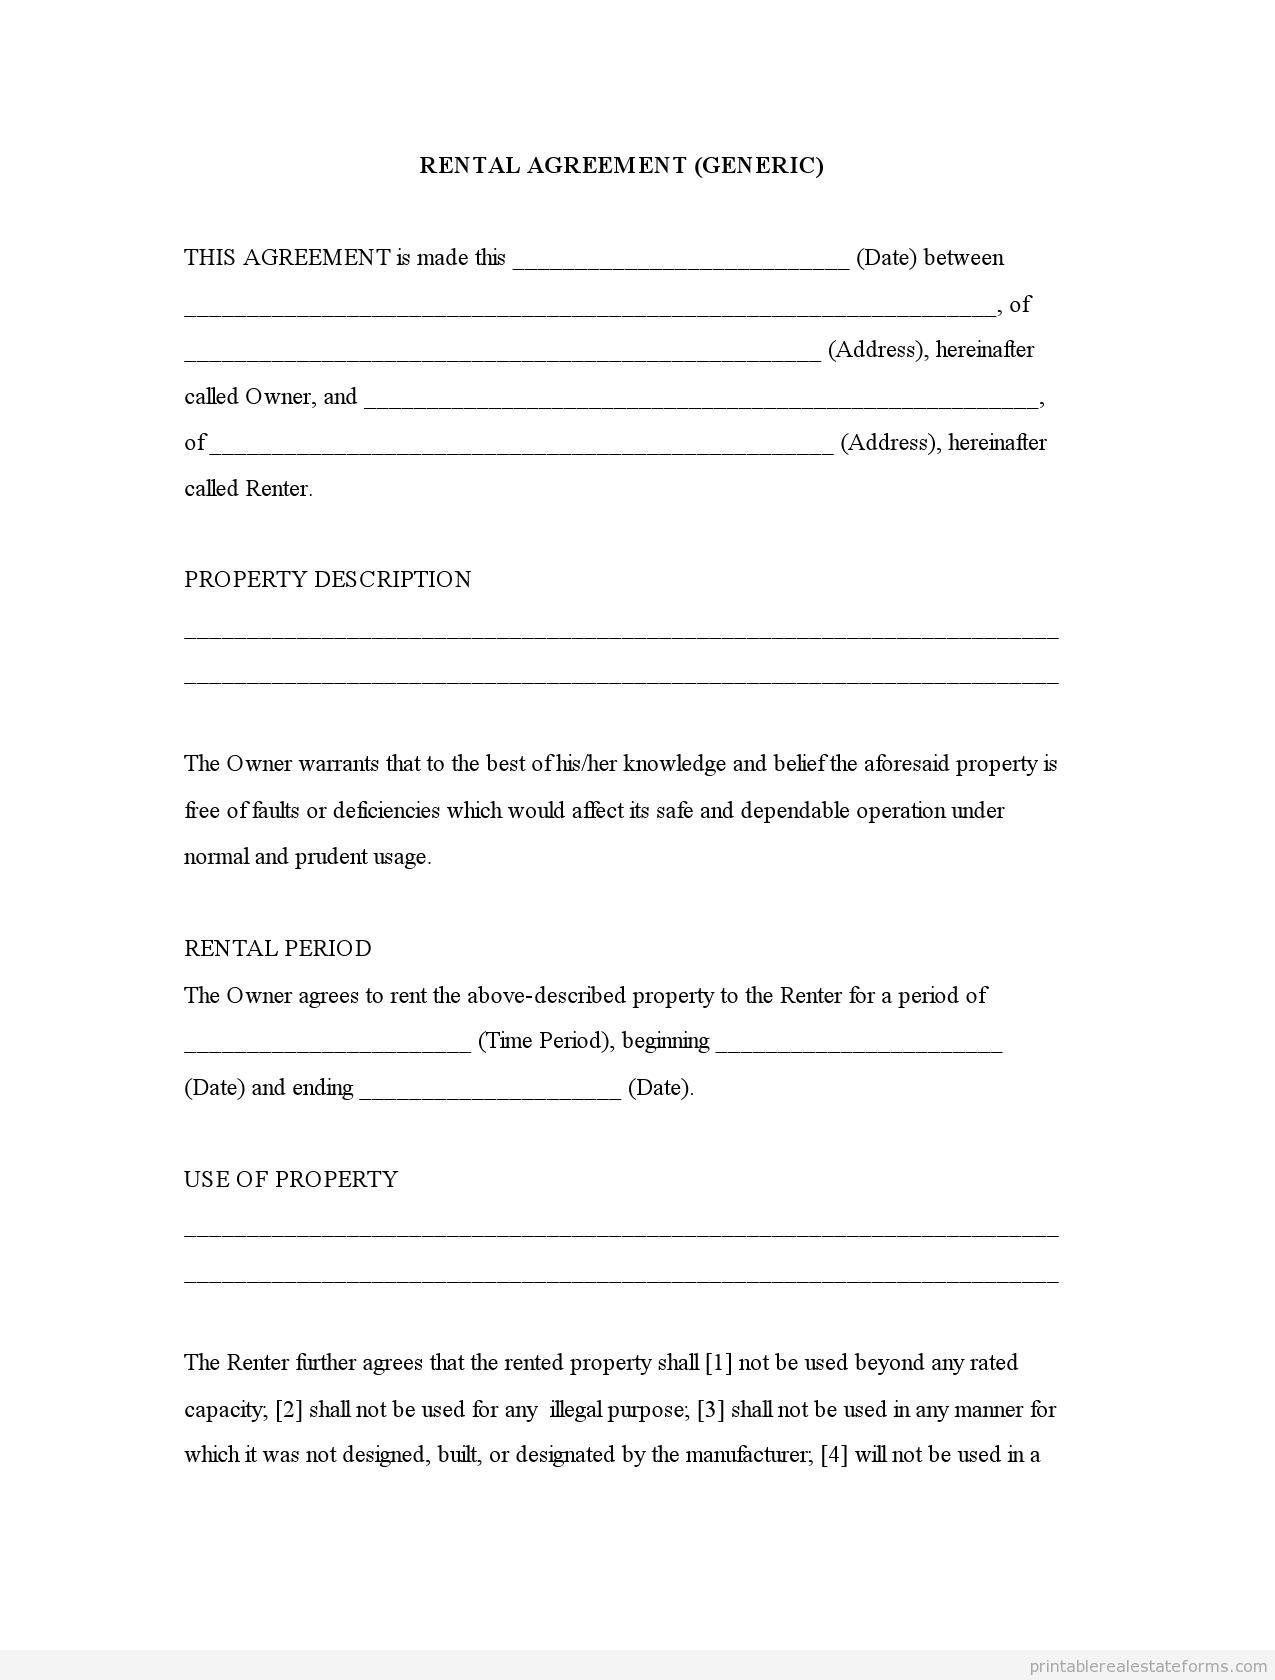 Free Printable Rental Agreement | Rental Agreement (Generic)0001 - Free Printable Rental Application Form